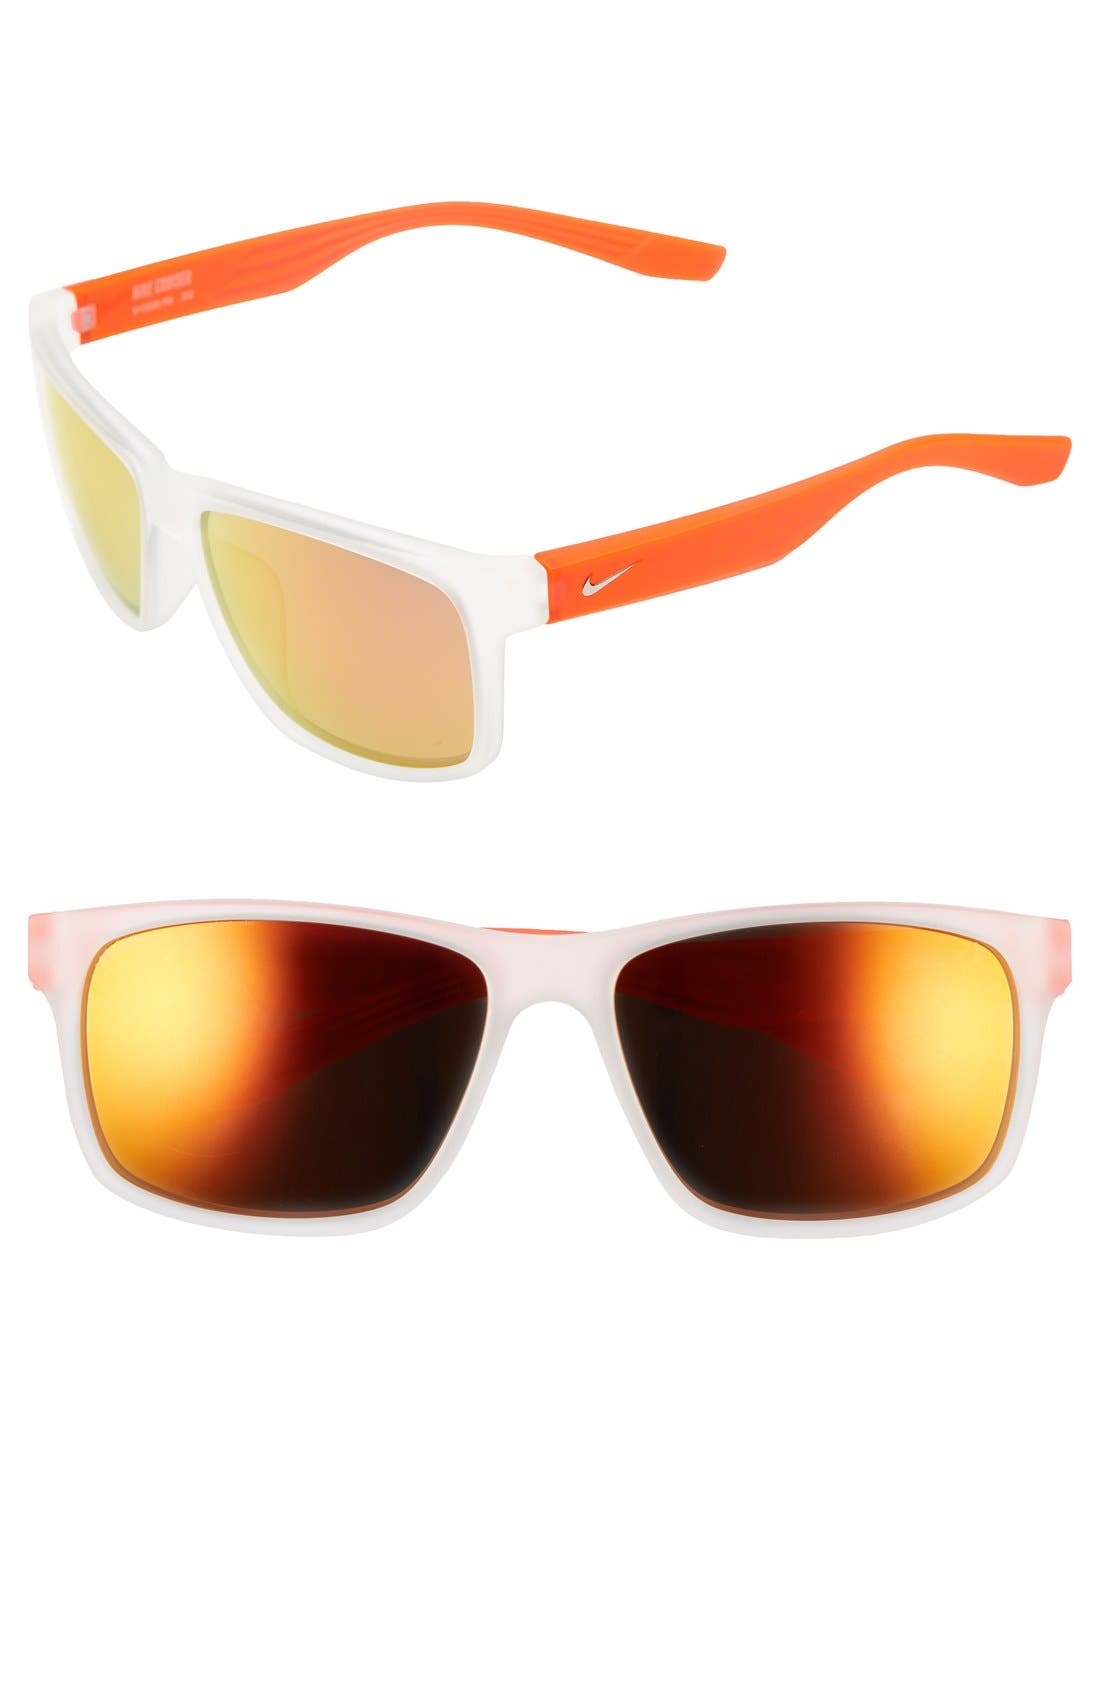 Alternate Image 1 Selected - Nike 'Cruiser R' 59mm Sunglasses